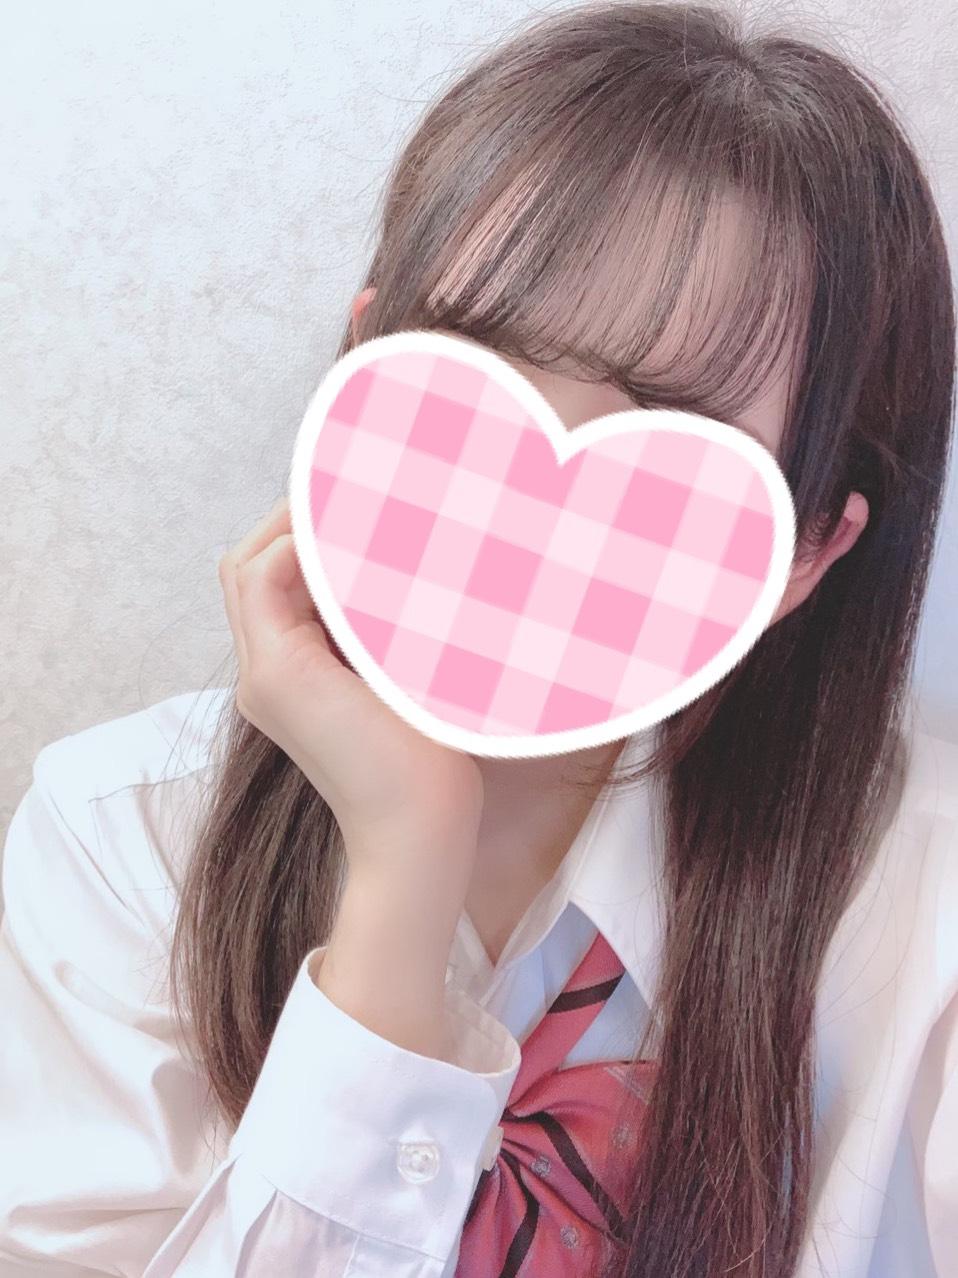 S__498442258